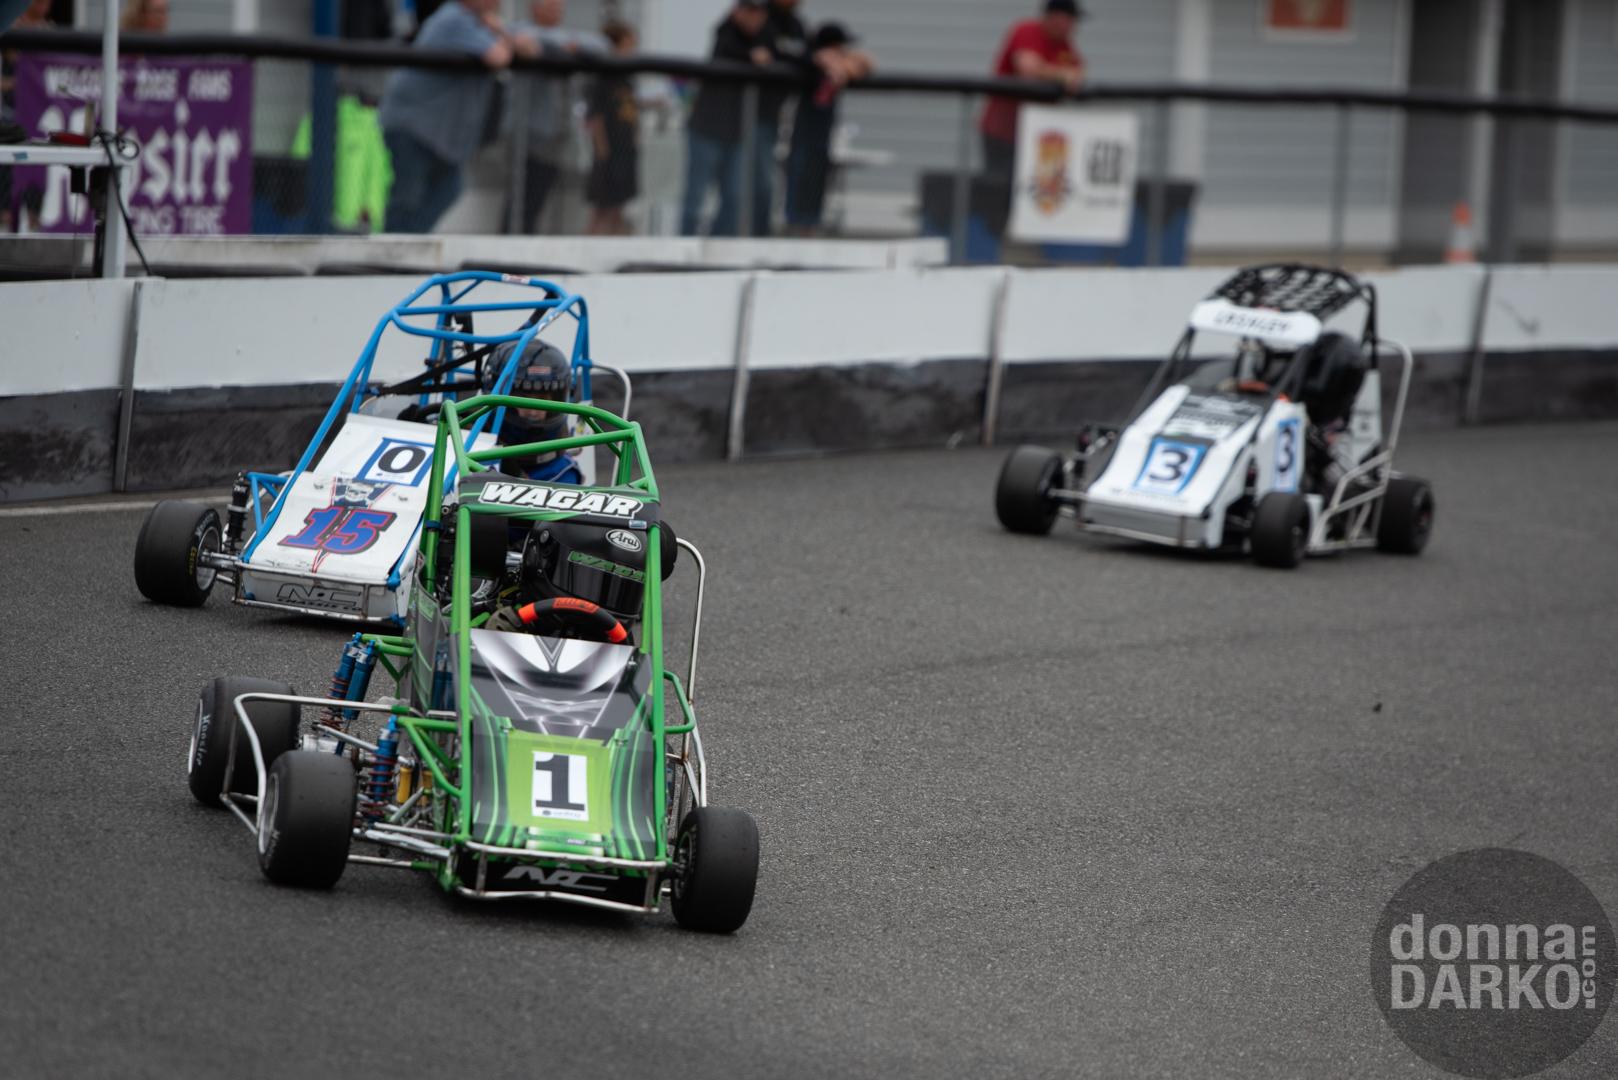 QWMA (Racing) 8-11-2019 DSC_6318.jpg